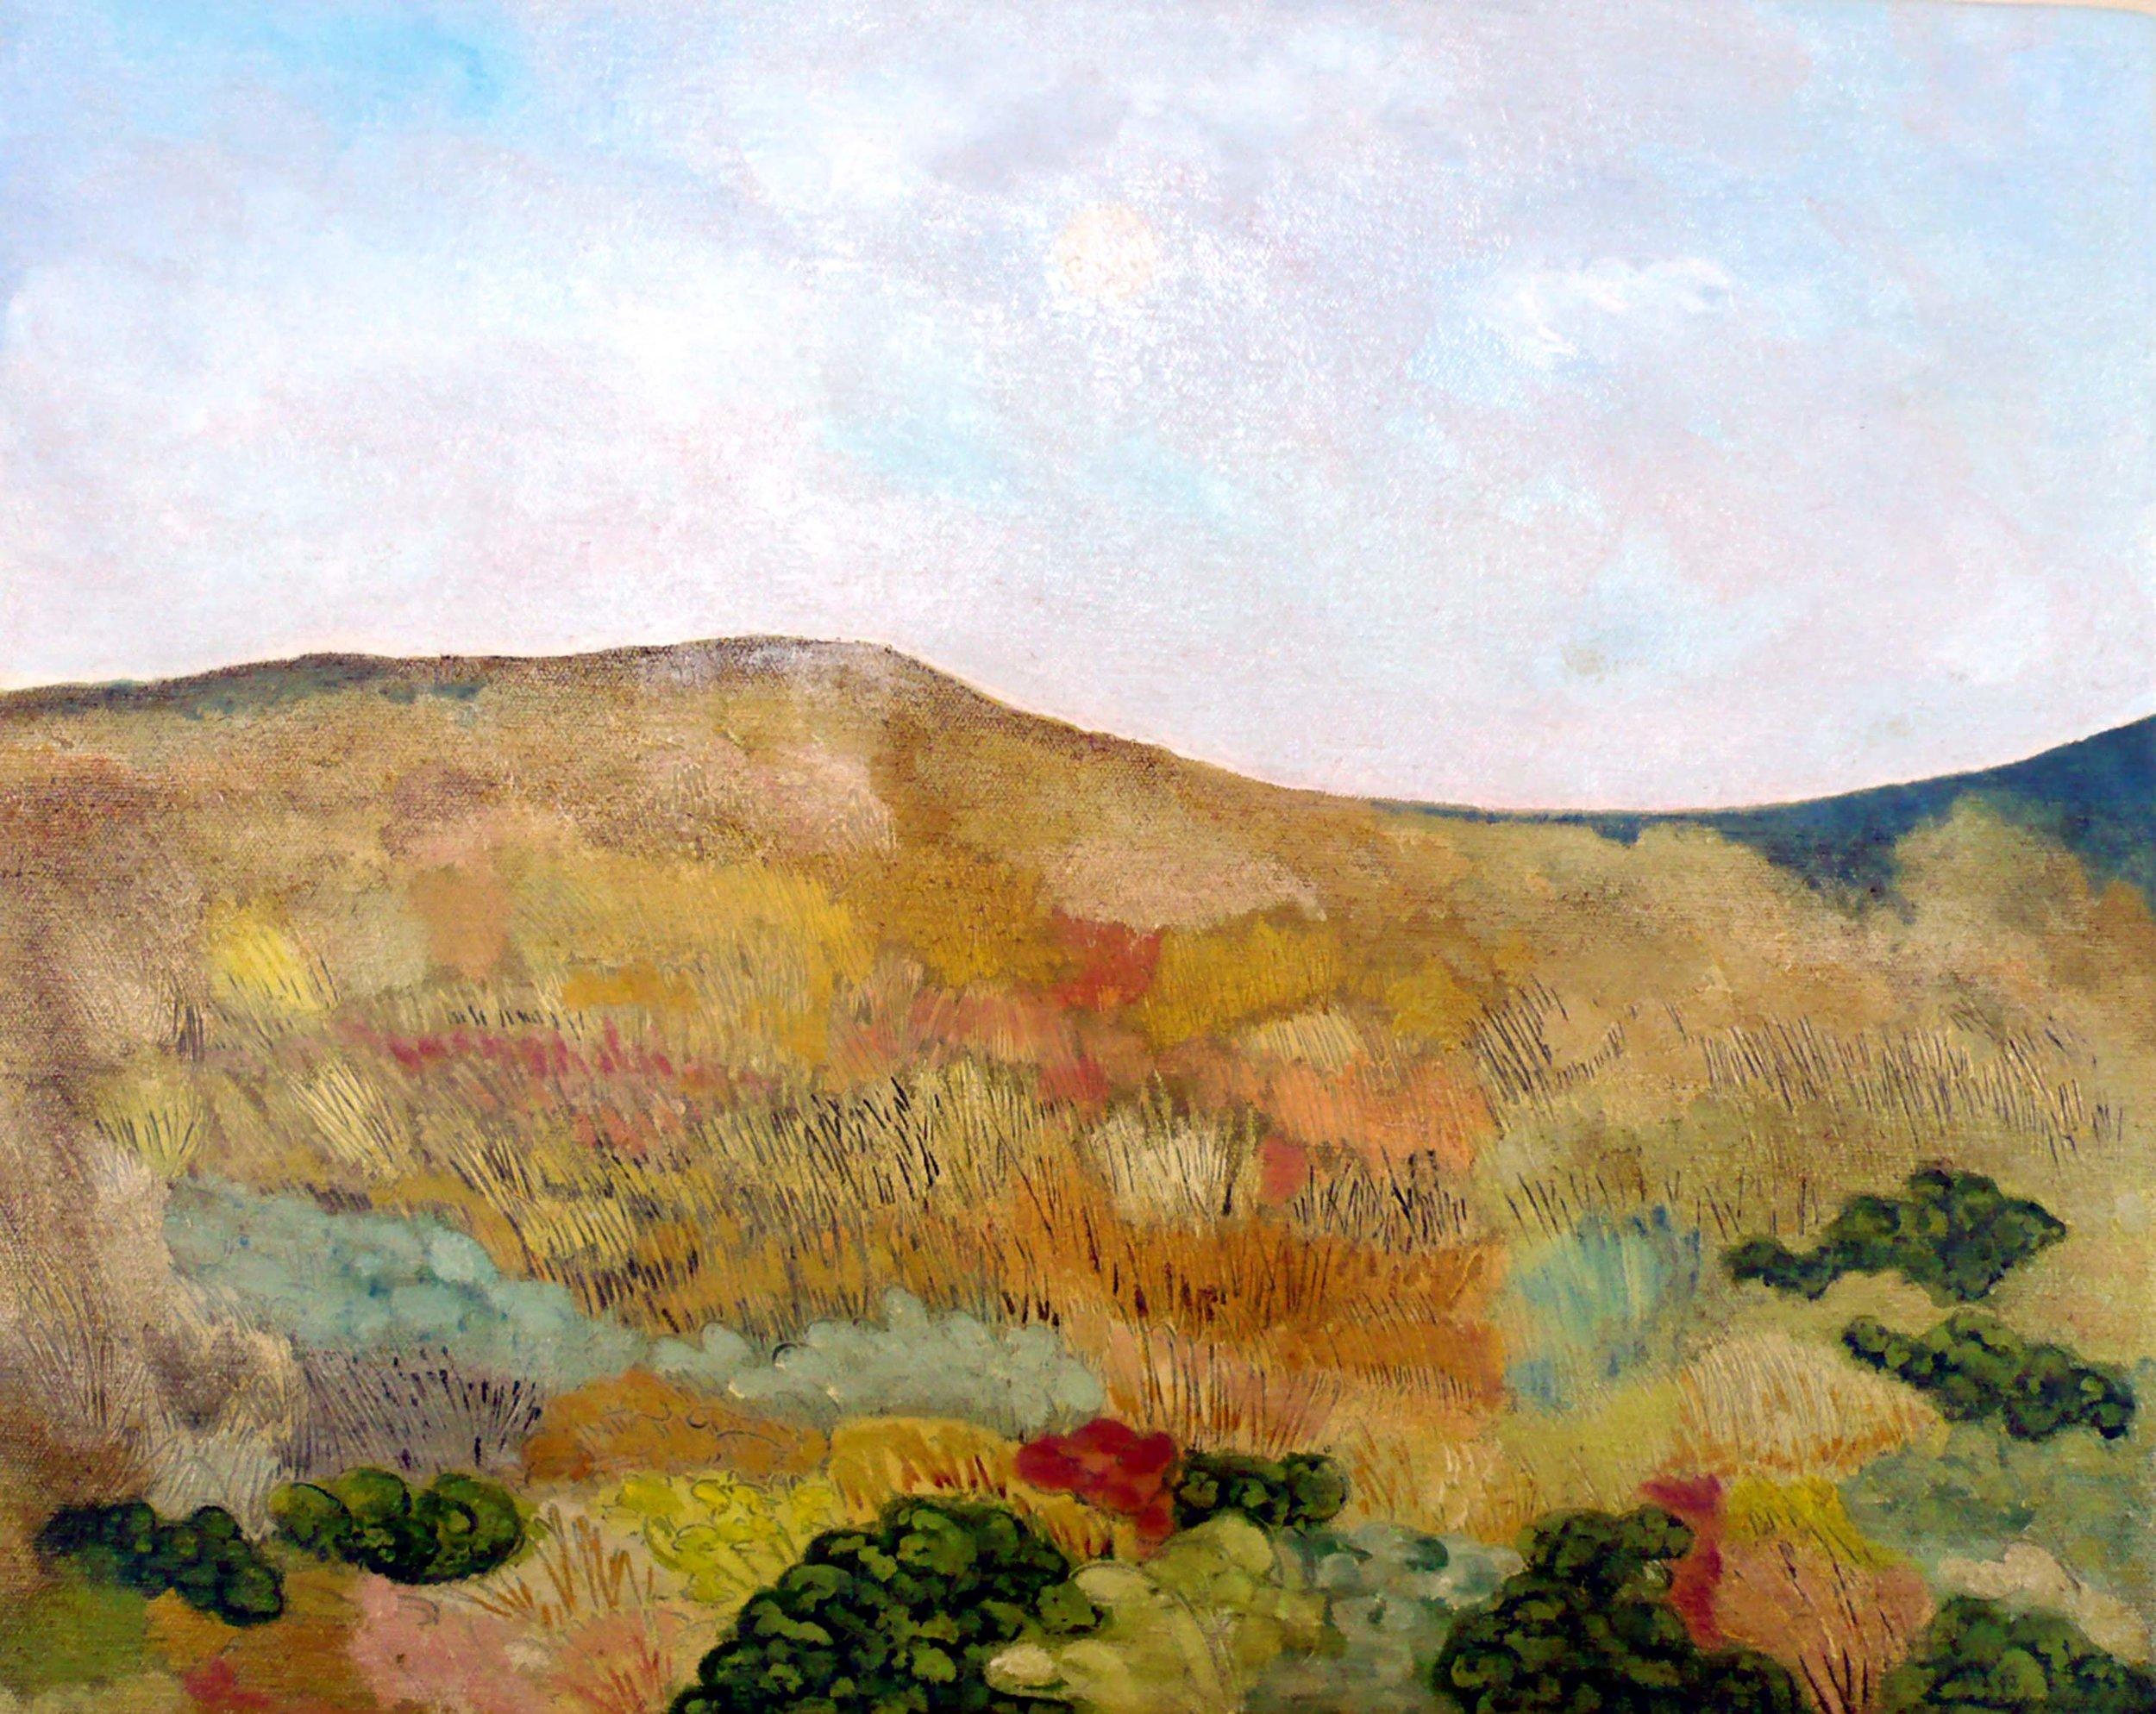 Paysage No 5 , circa 2008, huile sur toile / oil on canvas